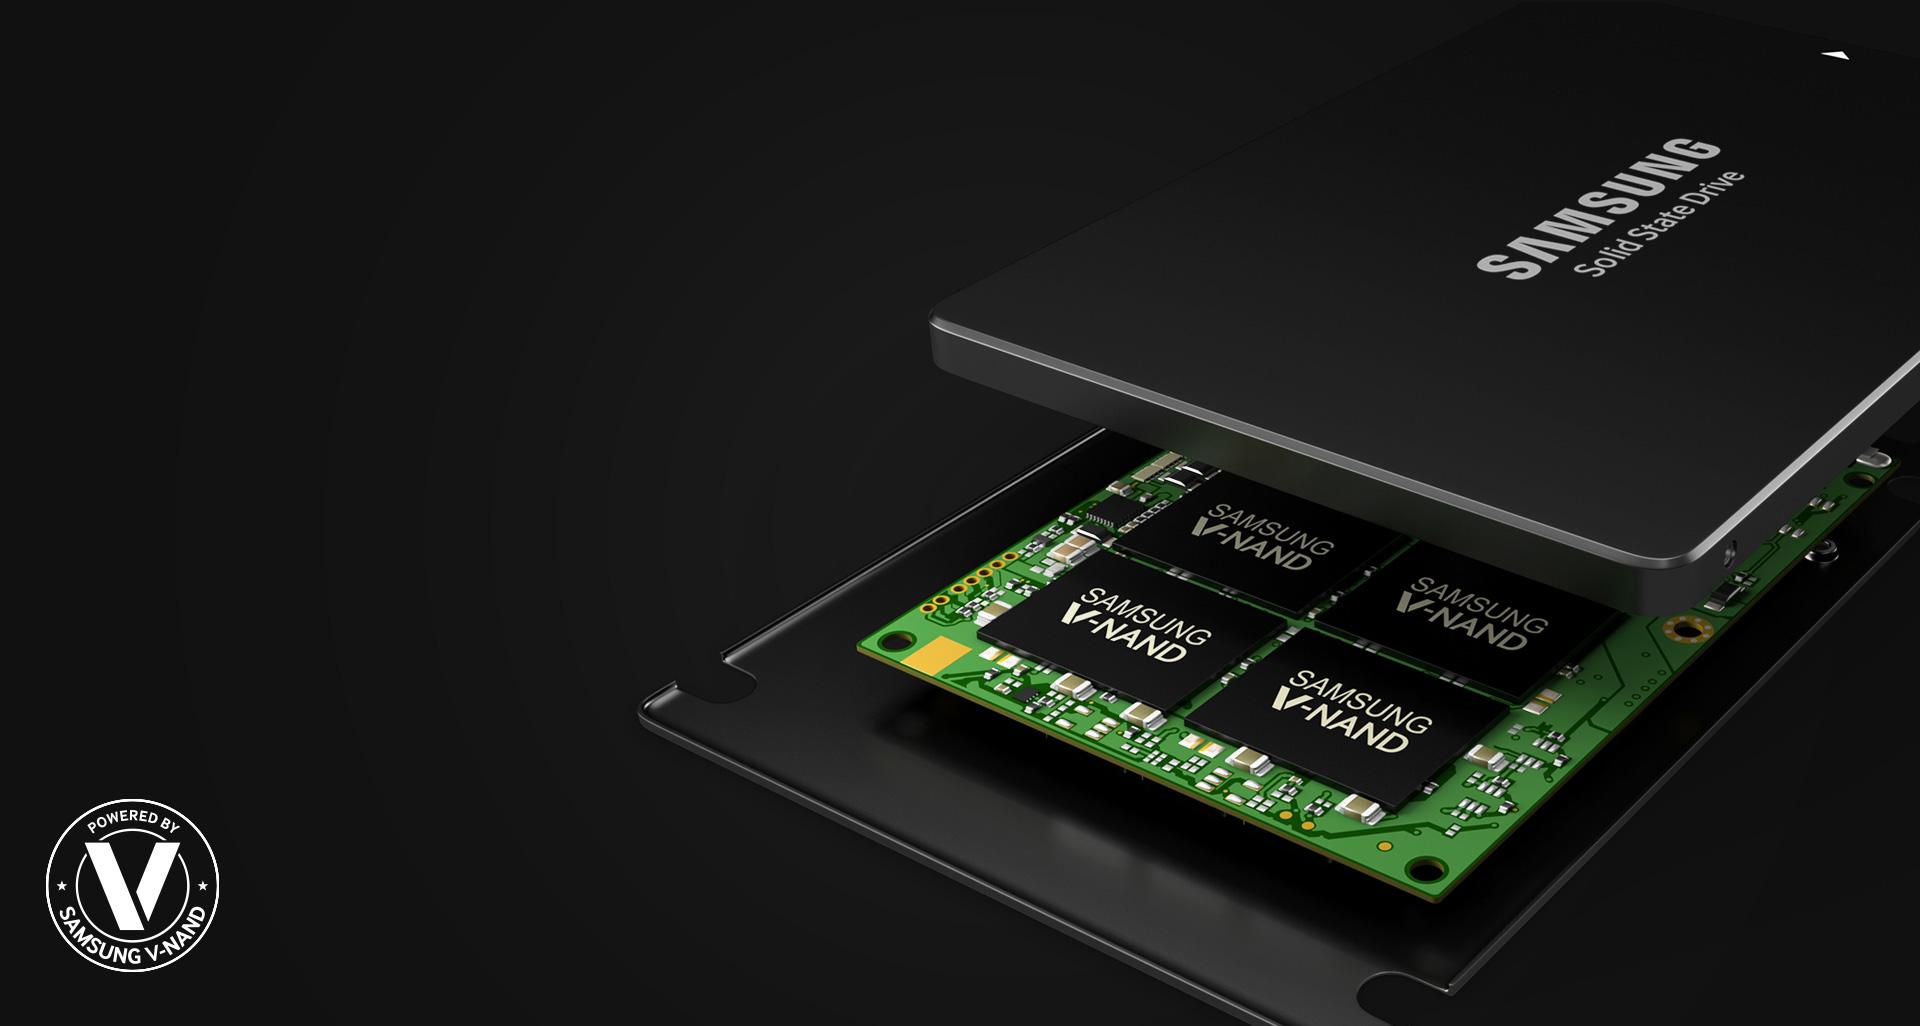 2 3 - اس اس دی سامسونگ Samsung SSD PM863a 480GB